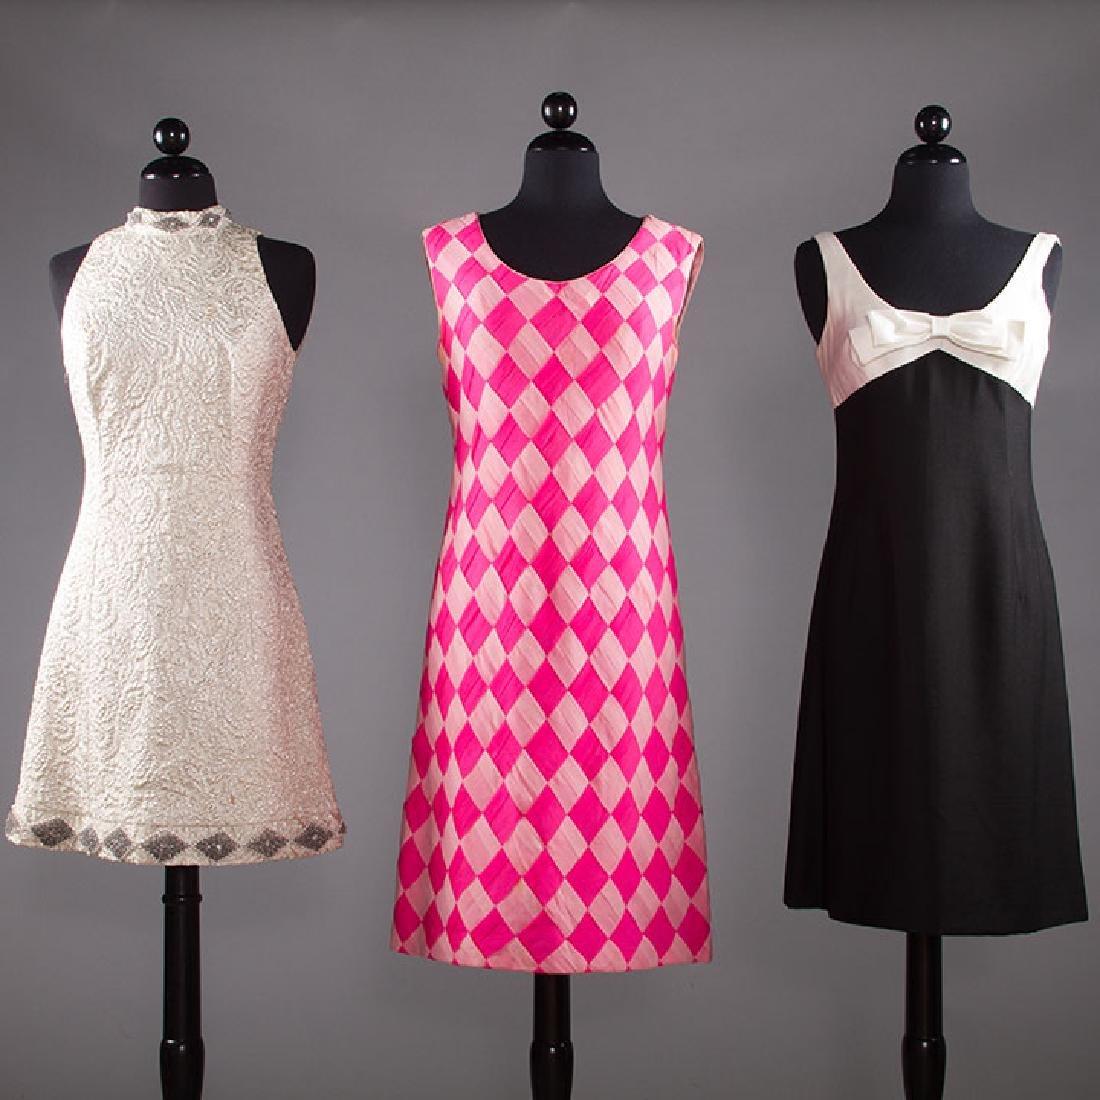 THREE PARTY DRESSES, 1960s